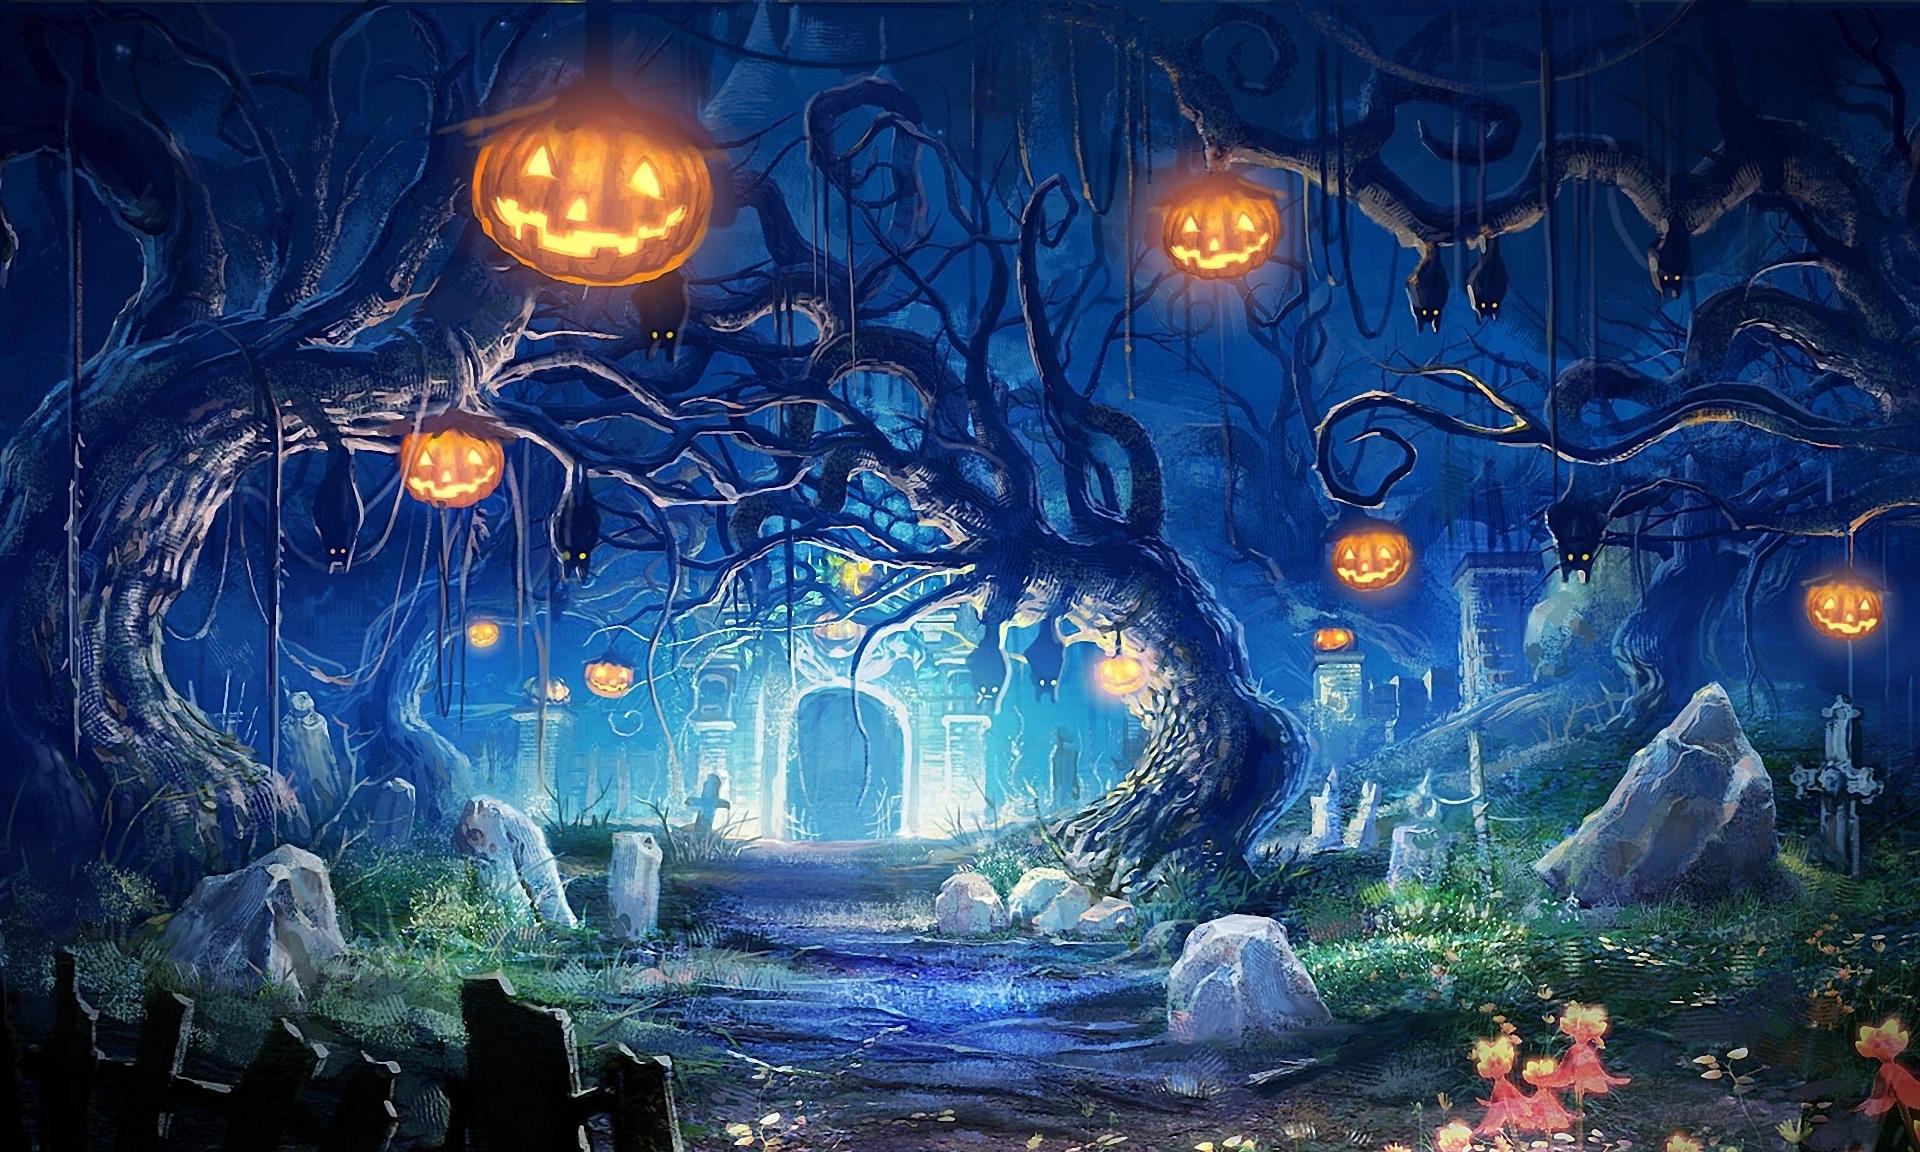 Fondos De Pantalla Gratis: Halloween Wallpapers, Halloween Fondos Hd Gratis